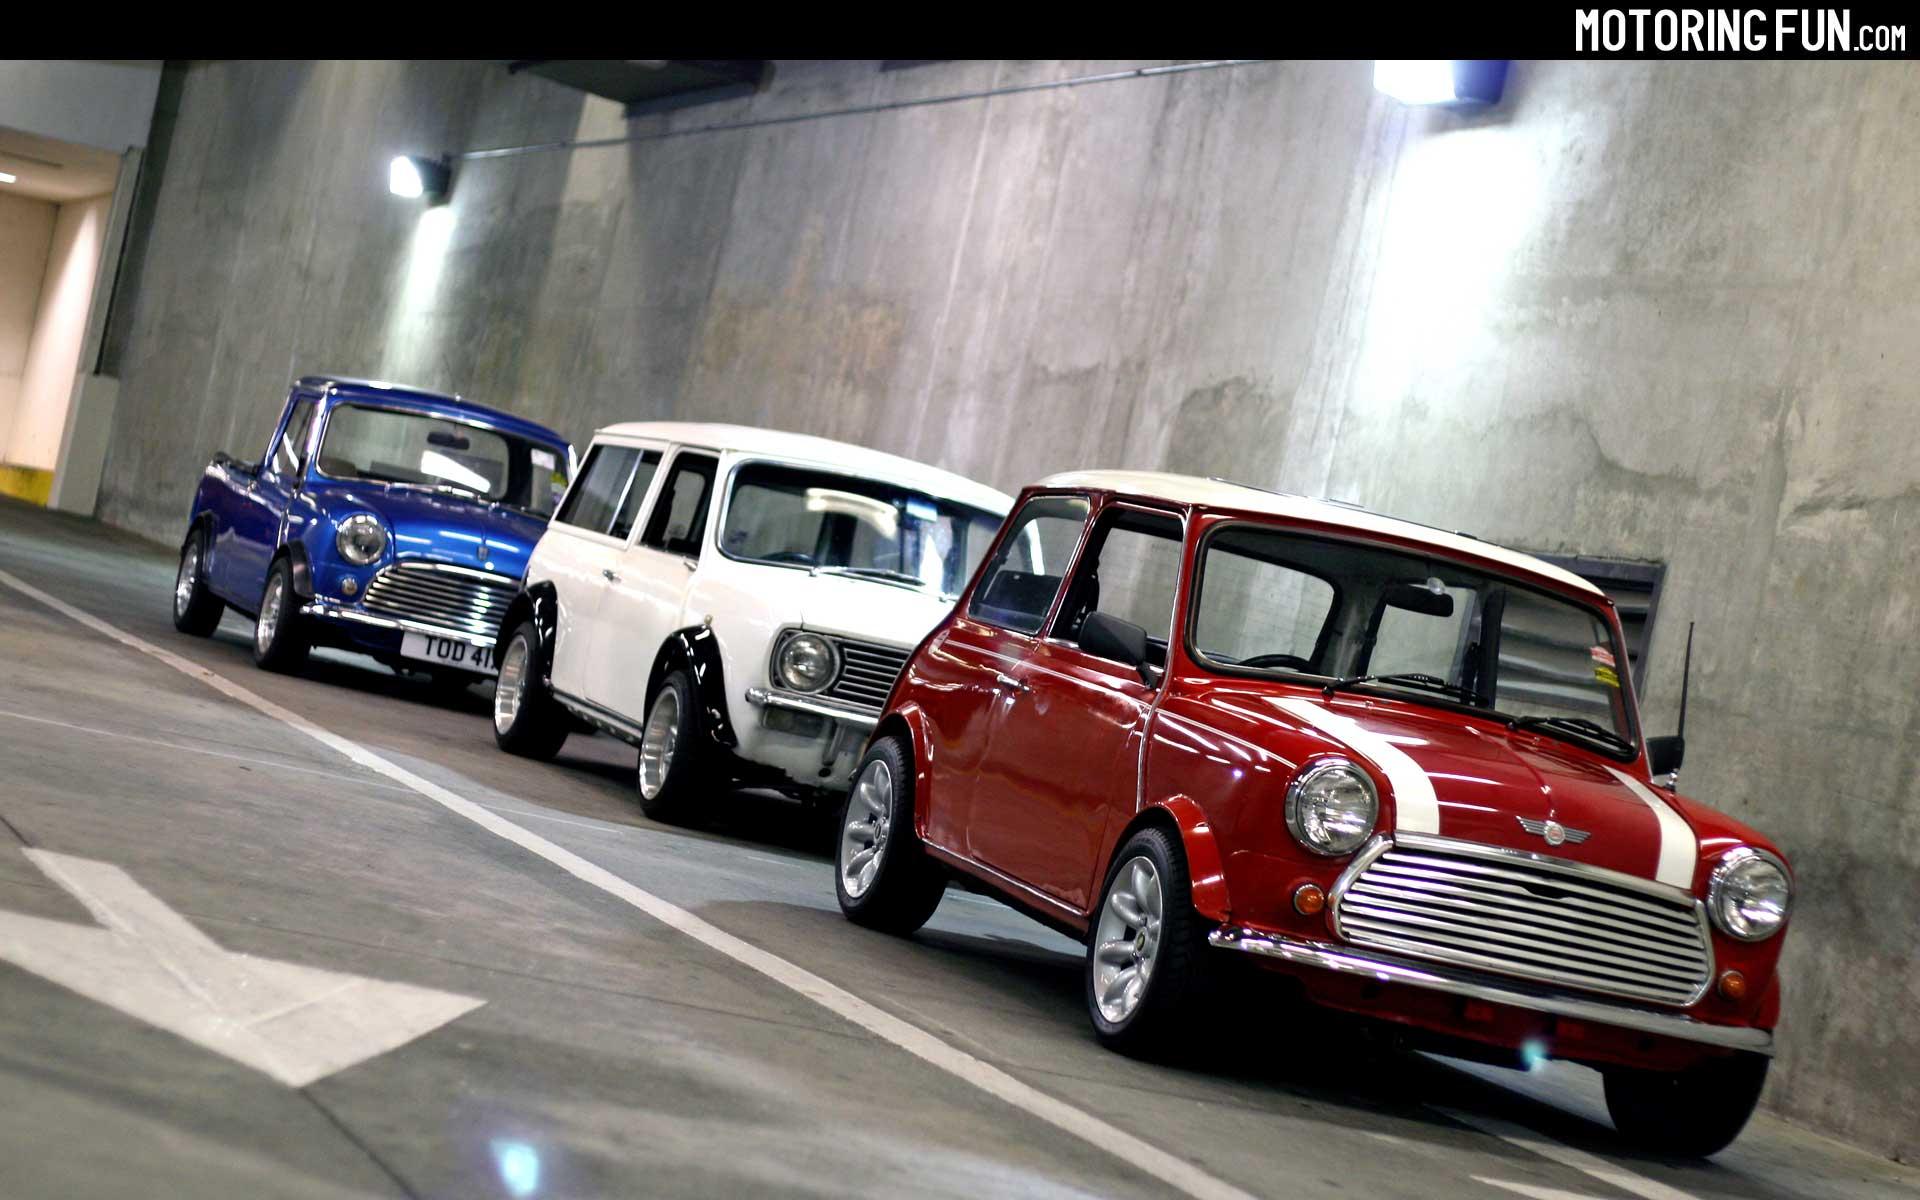 Mini Cooper Wallpaper Hd >> Classic Mini | MotoringFun.com